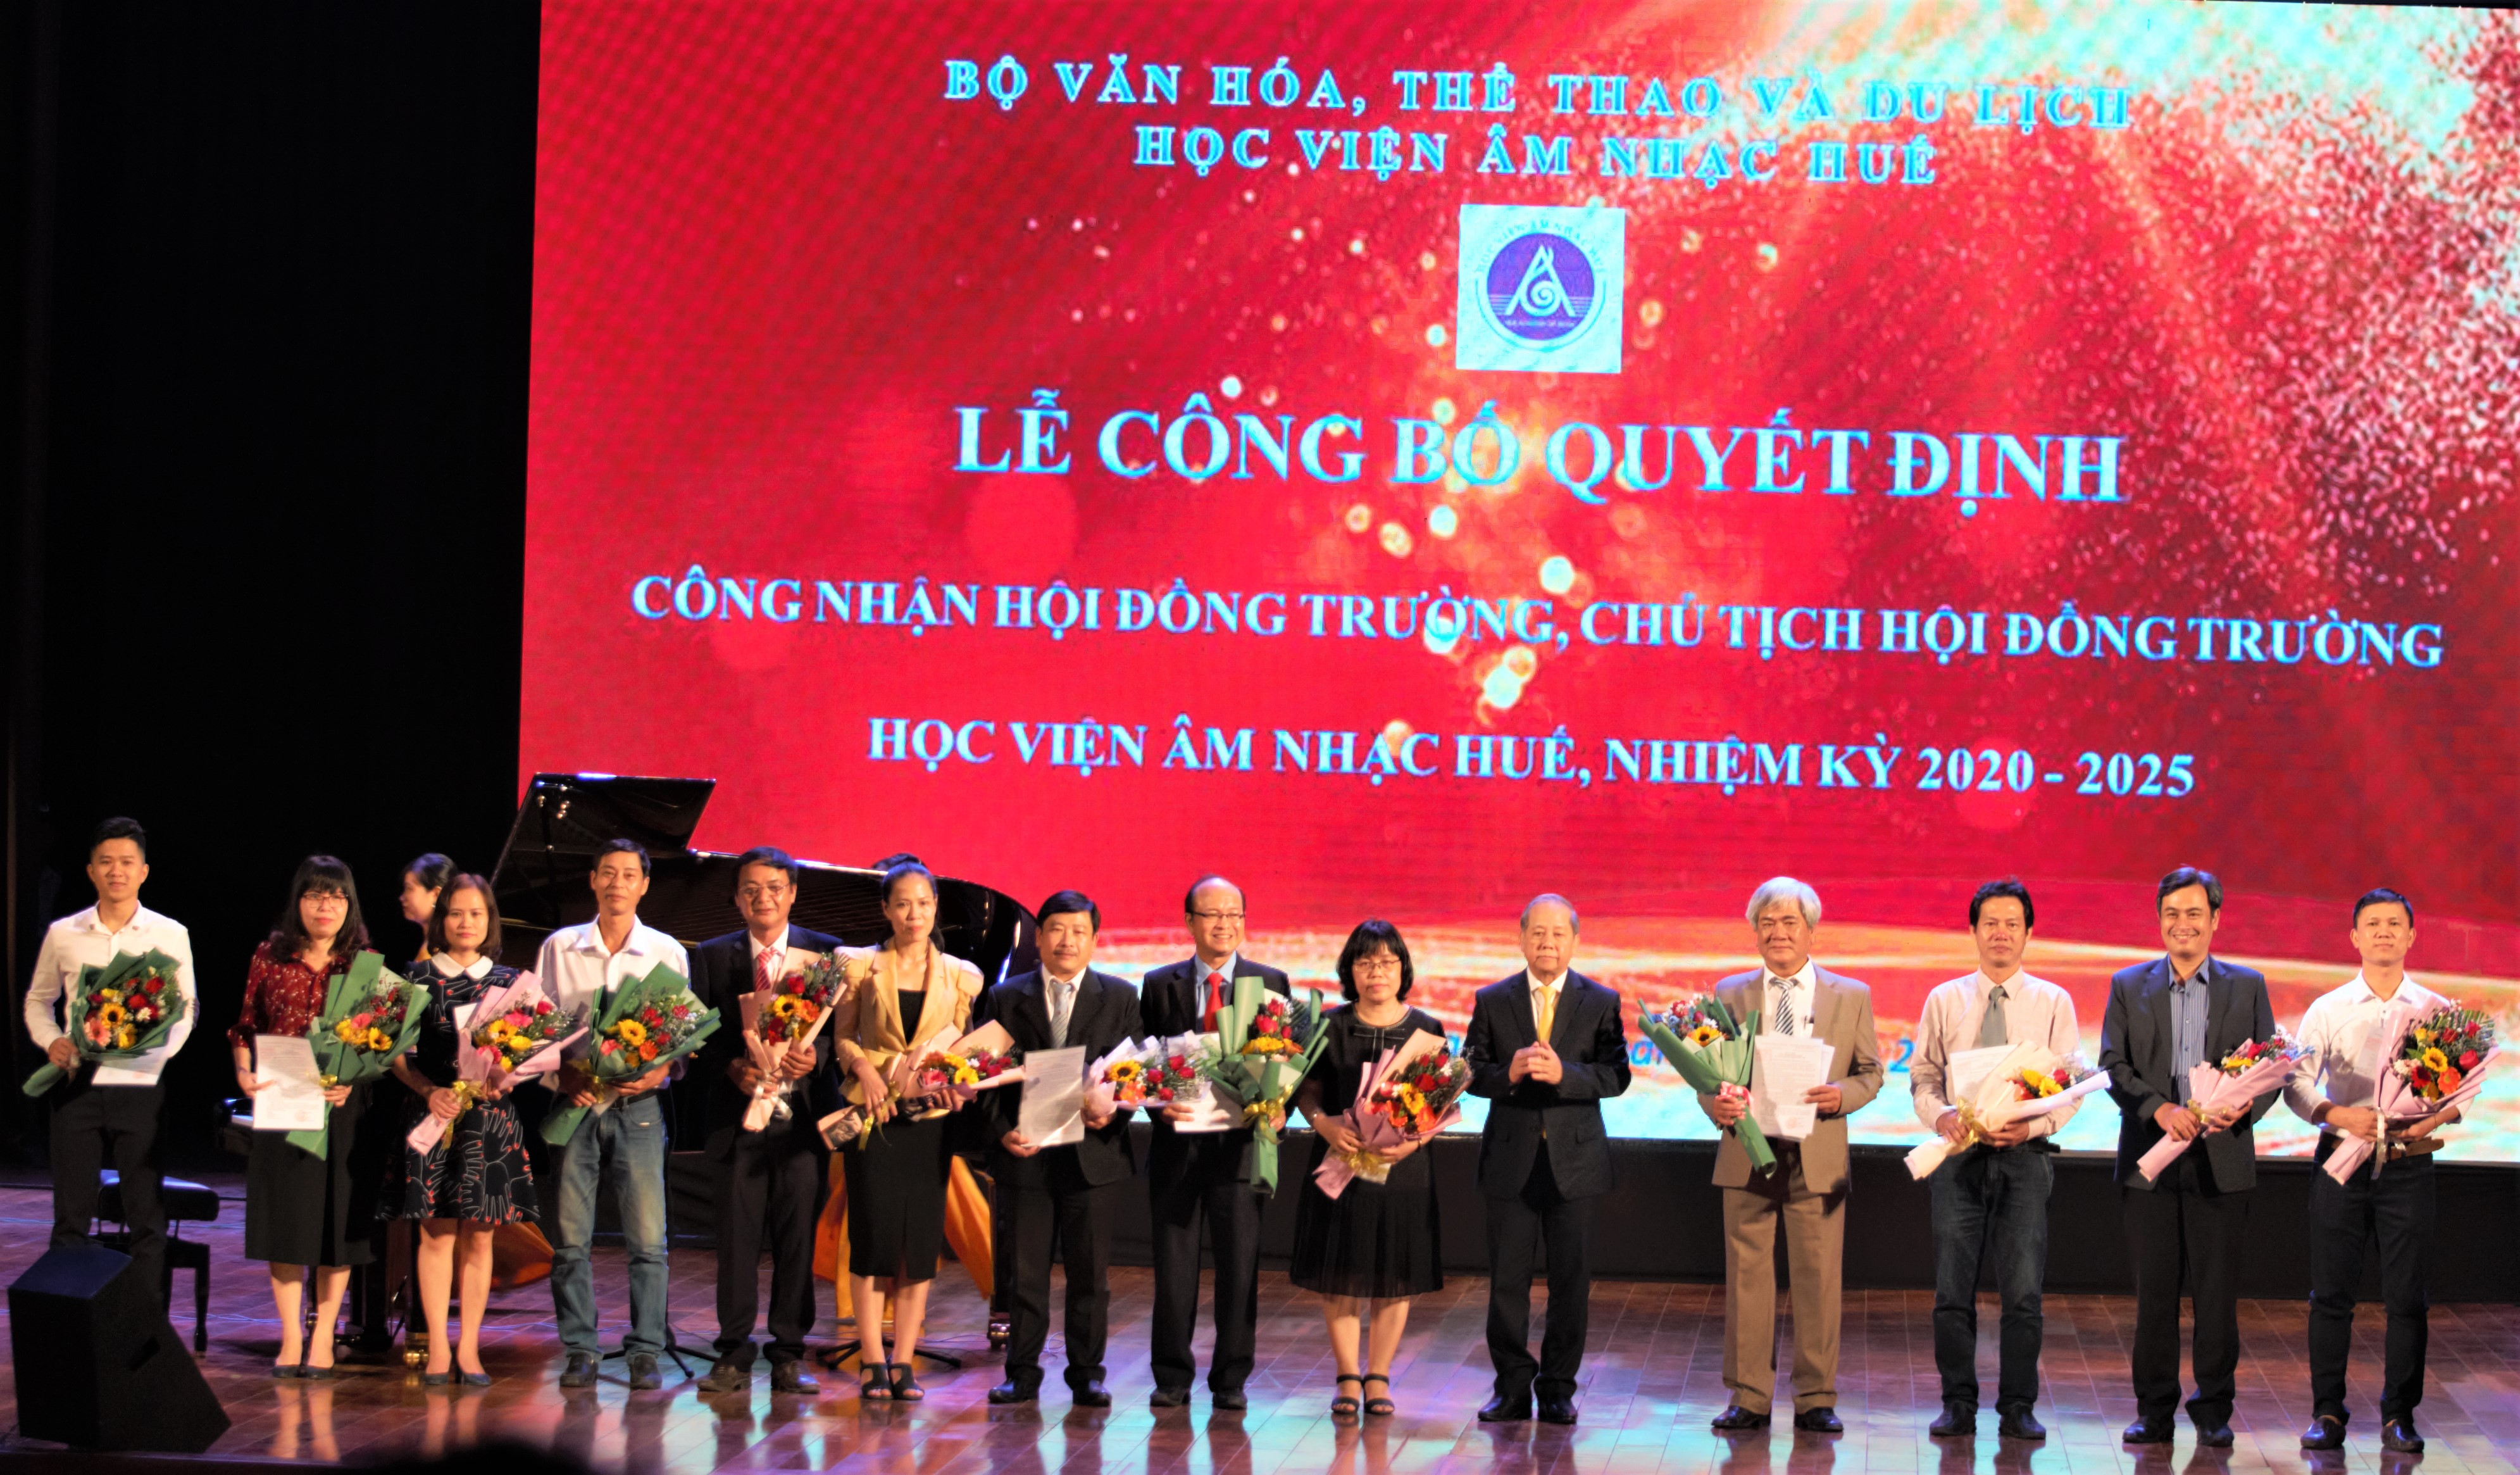 Hue Winter show in Hanoi